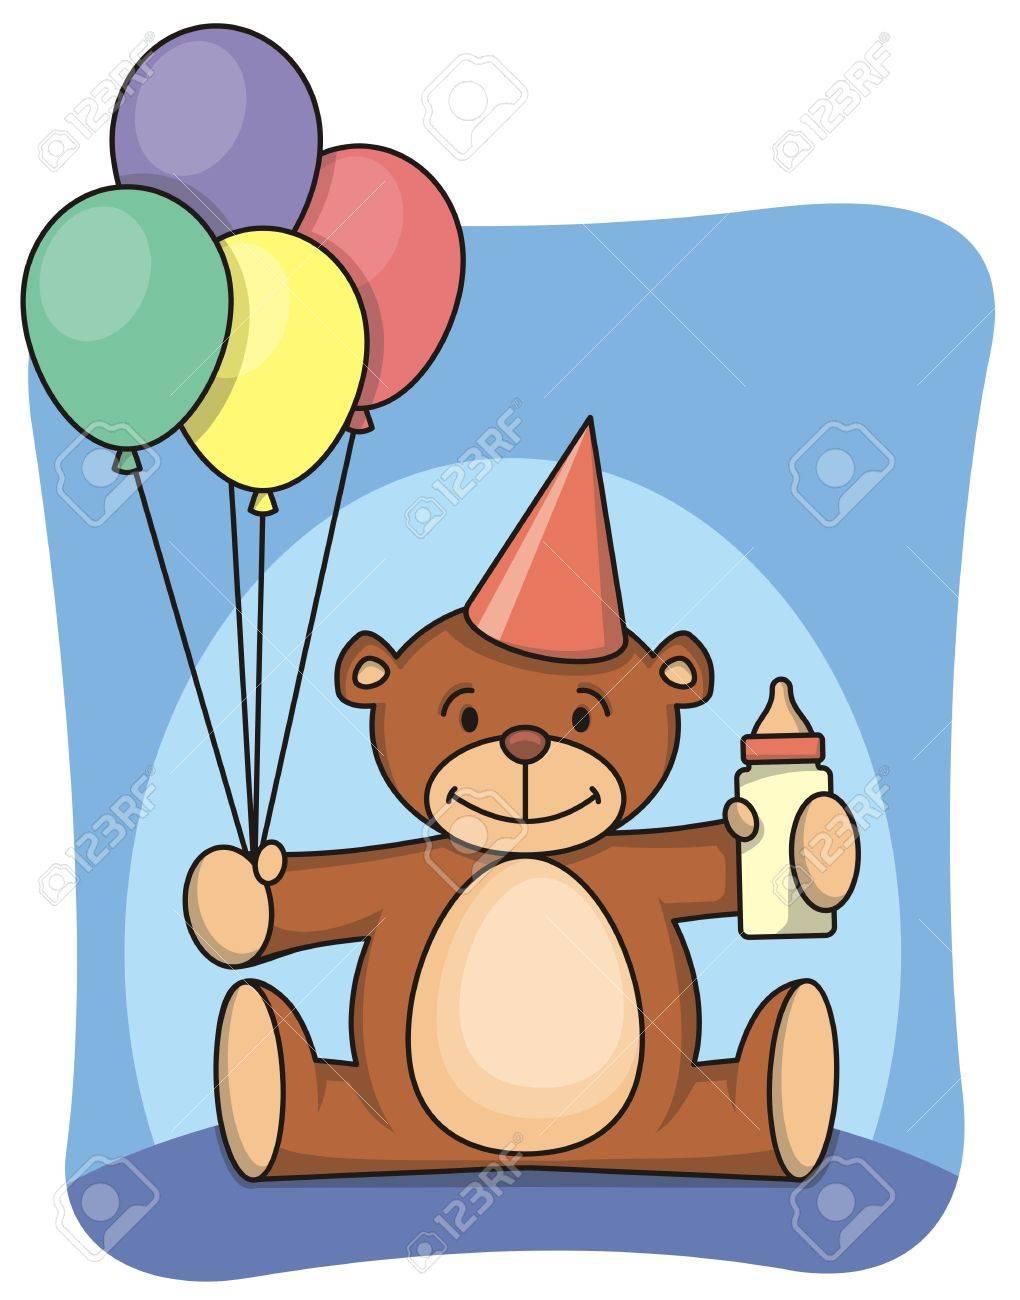 Teddy bear celebrates first birthday - 1885772